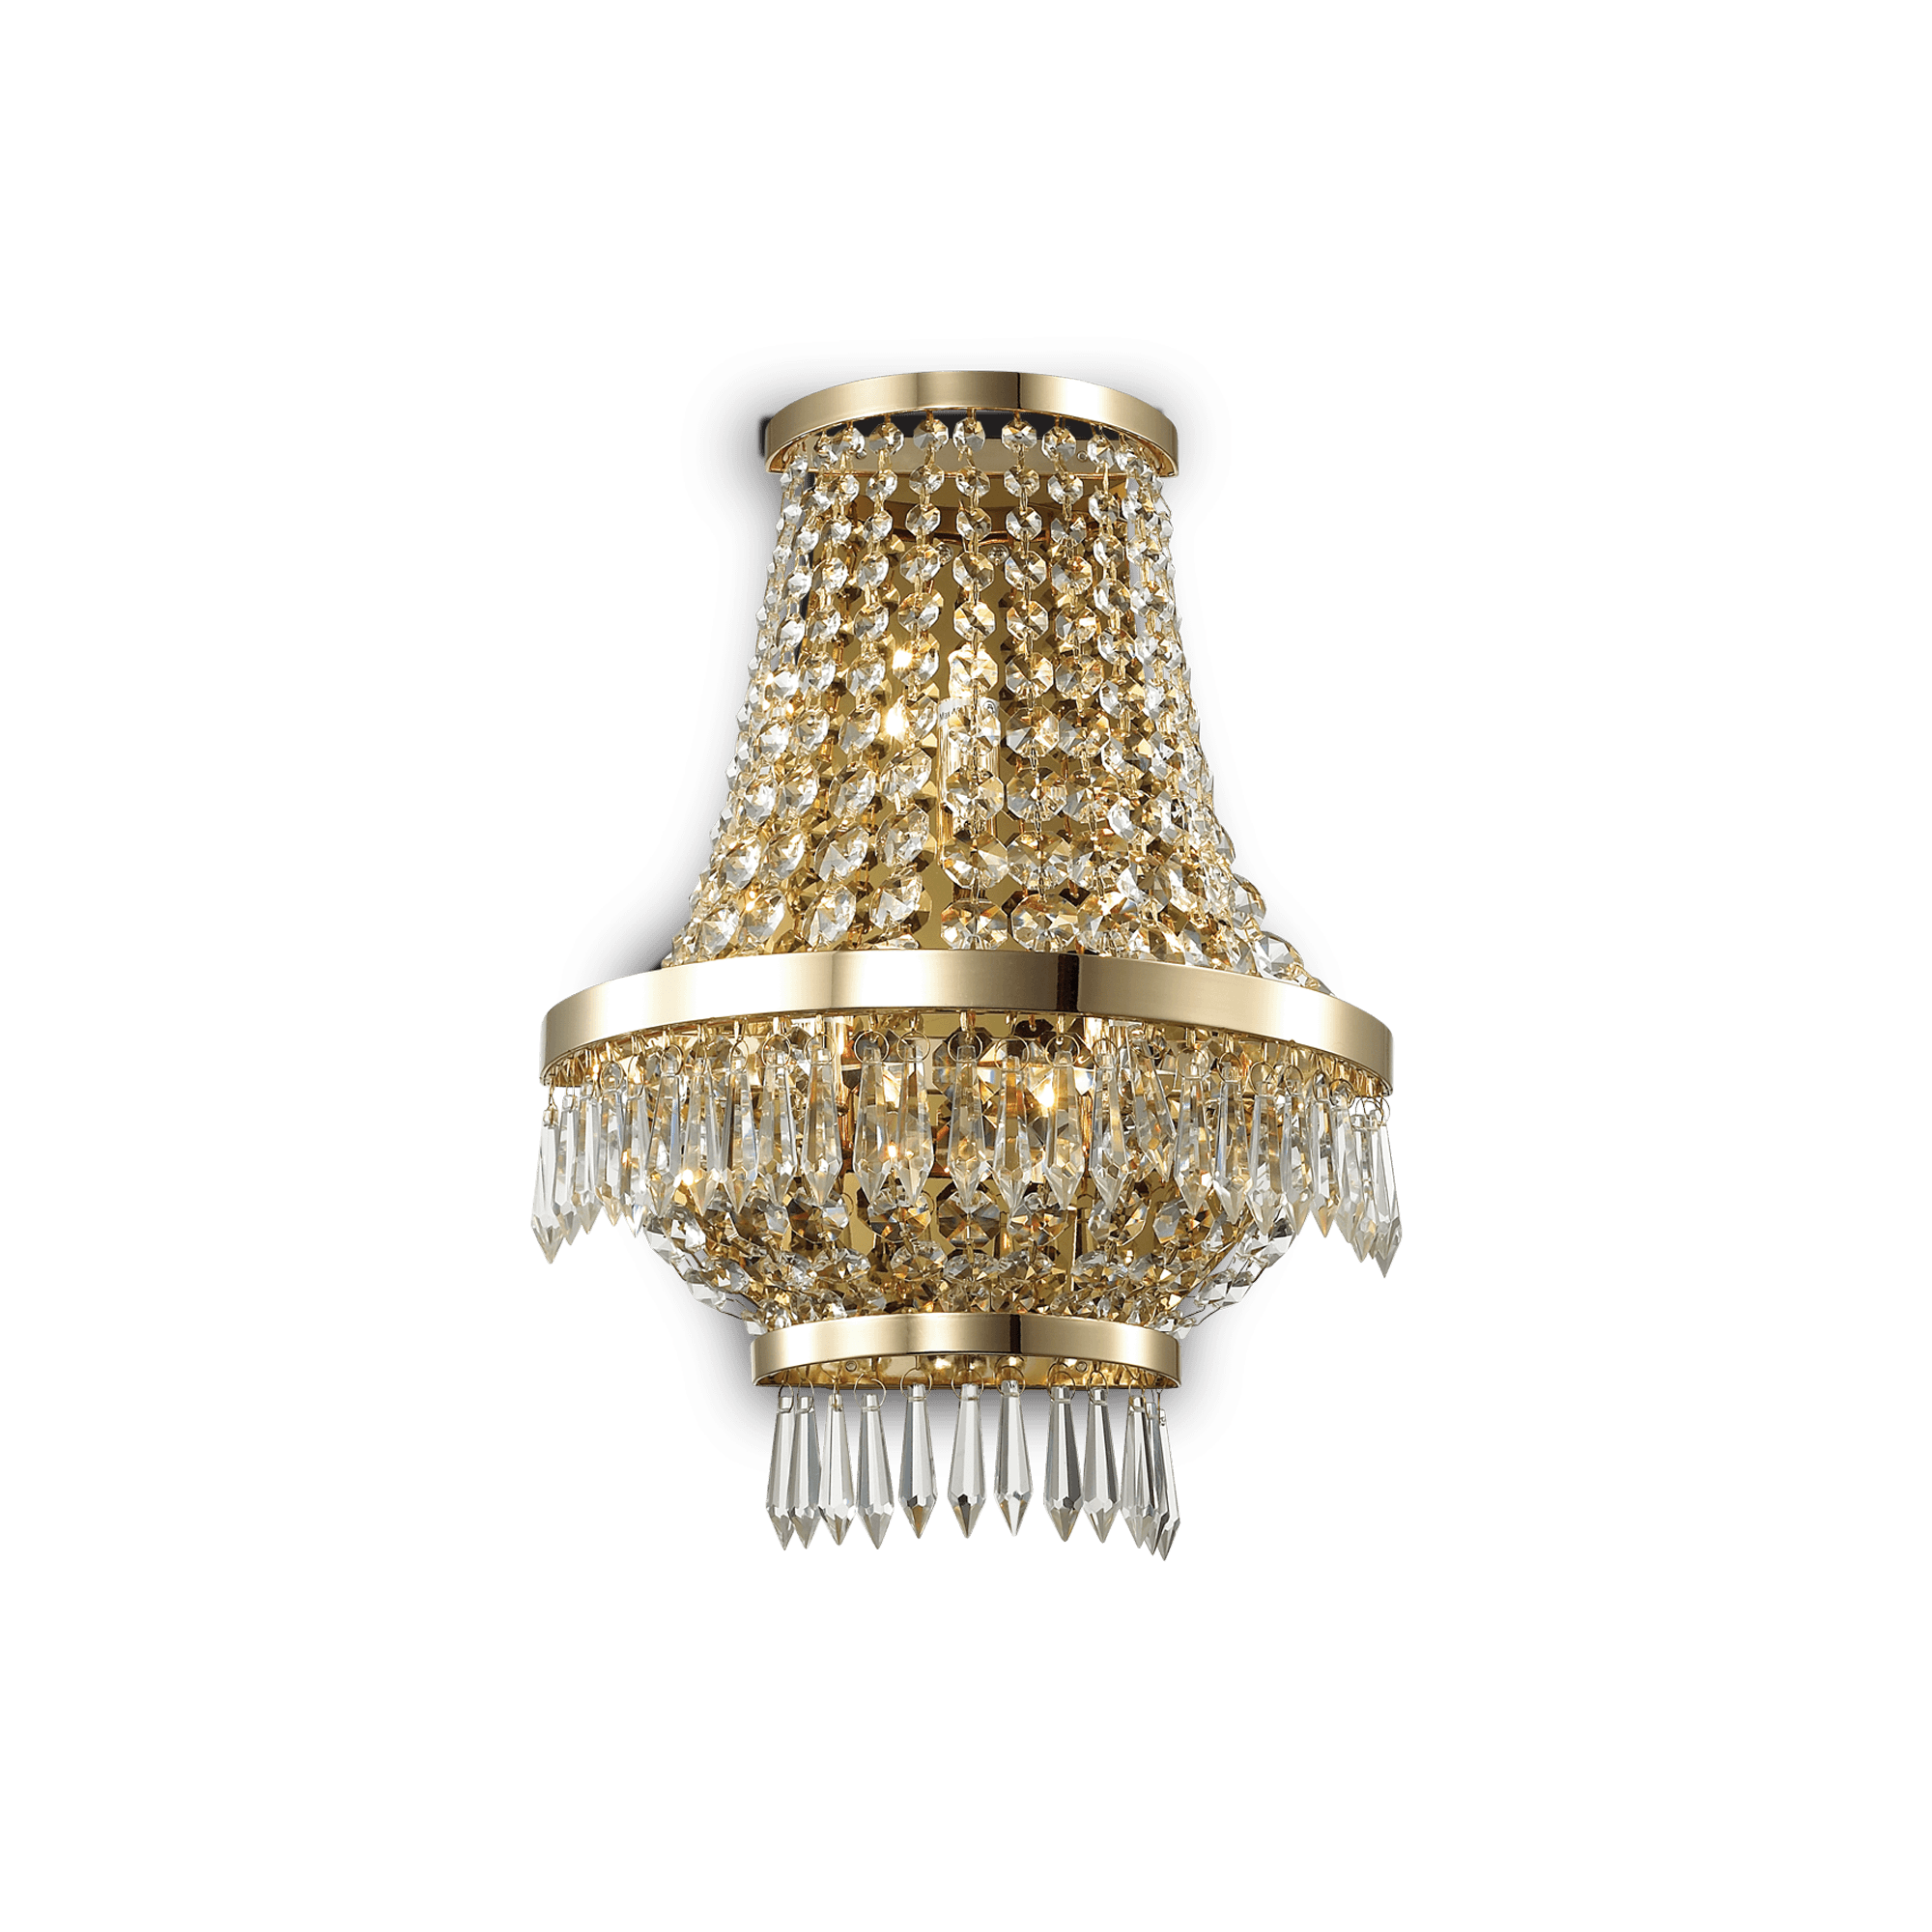 Ideal Lux 137704 CAESAR AP3 ORO kristály falilámpa